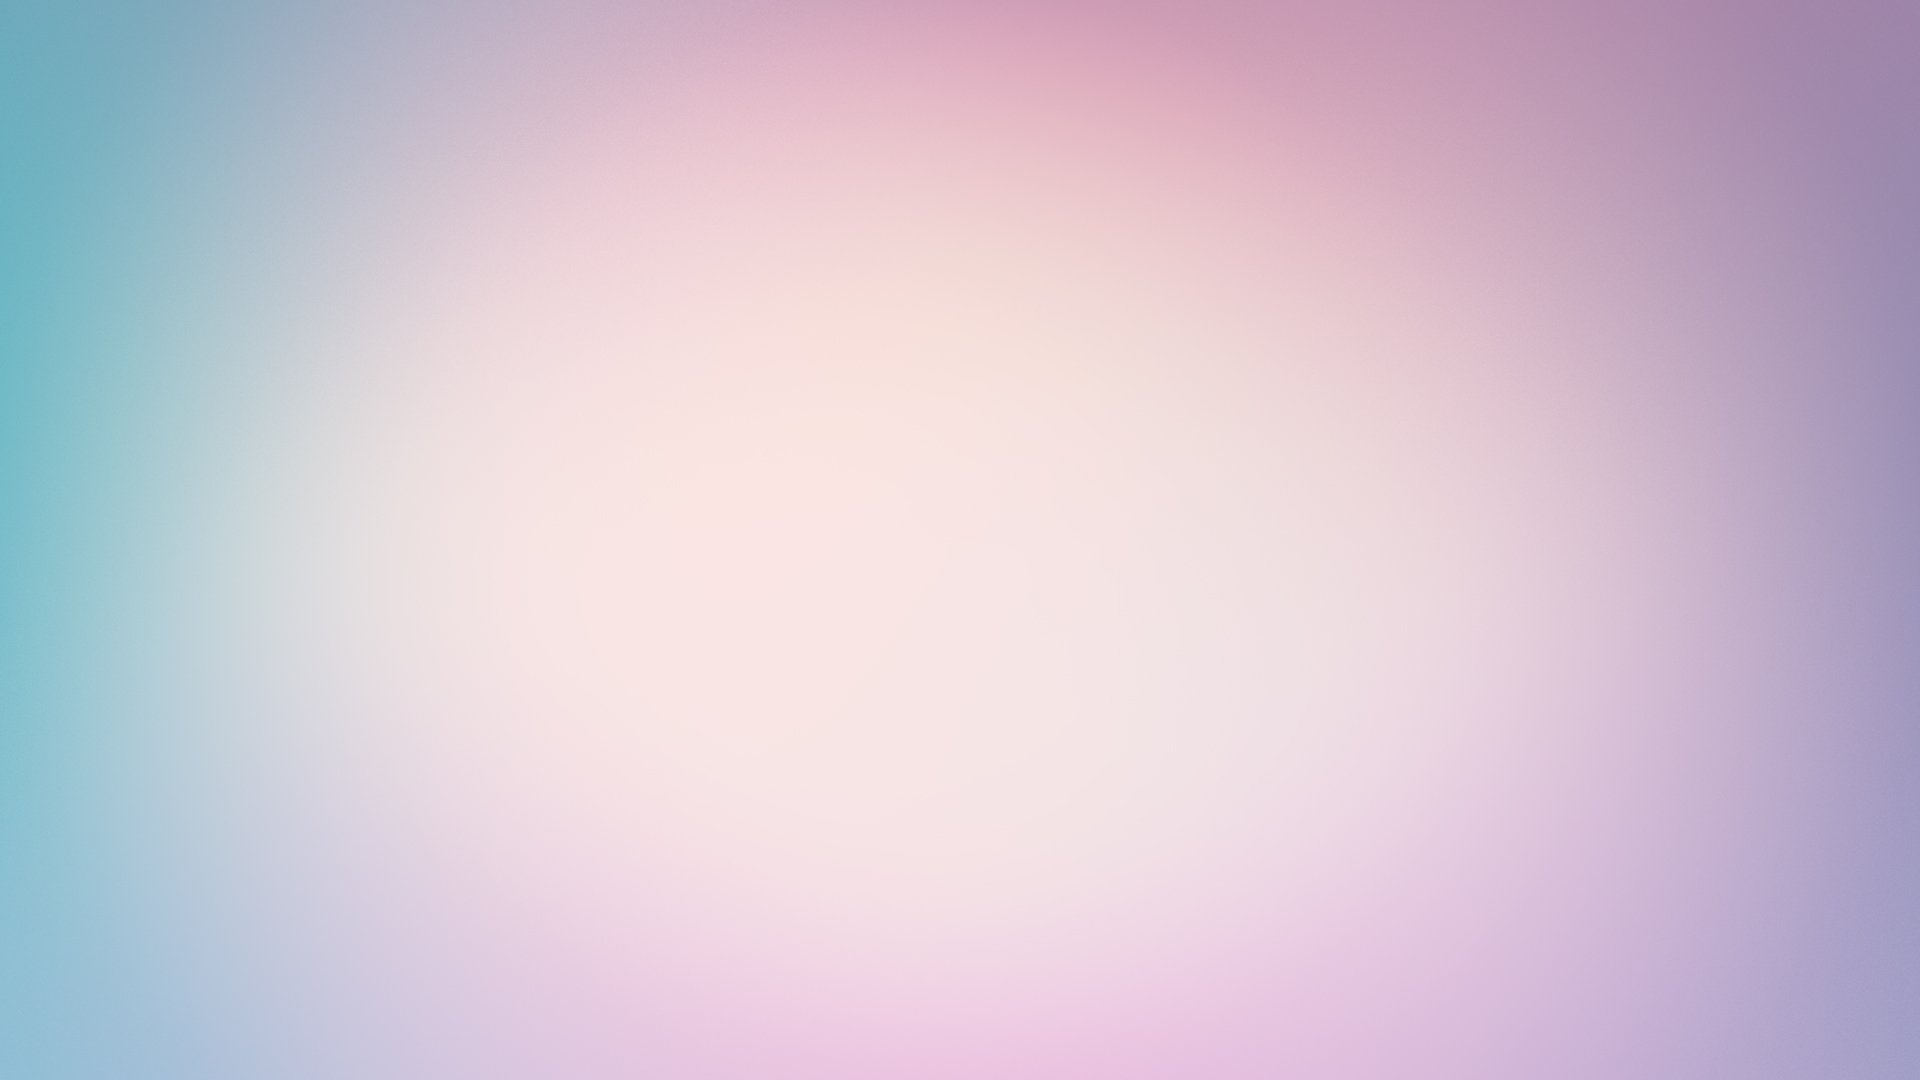 Soft Background Images - WallpaperSafari